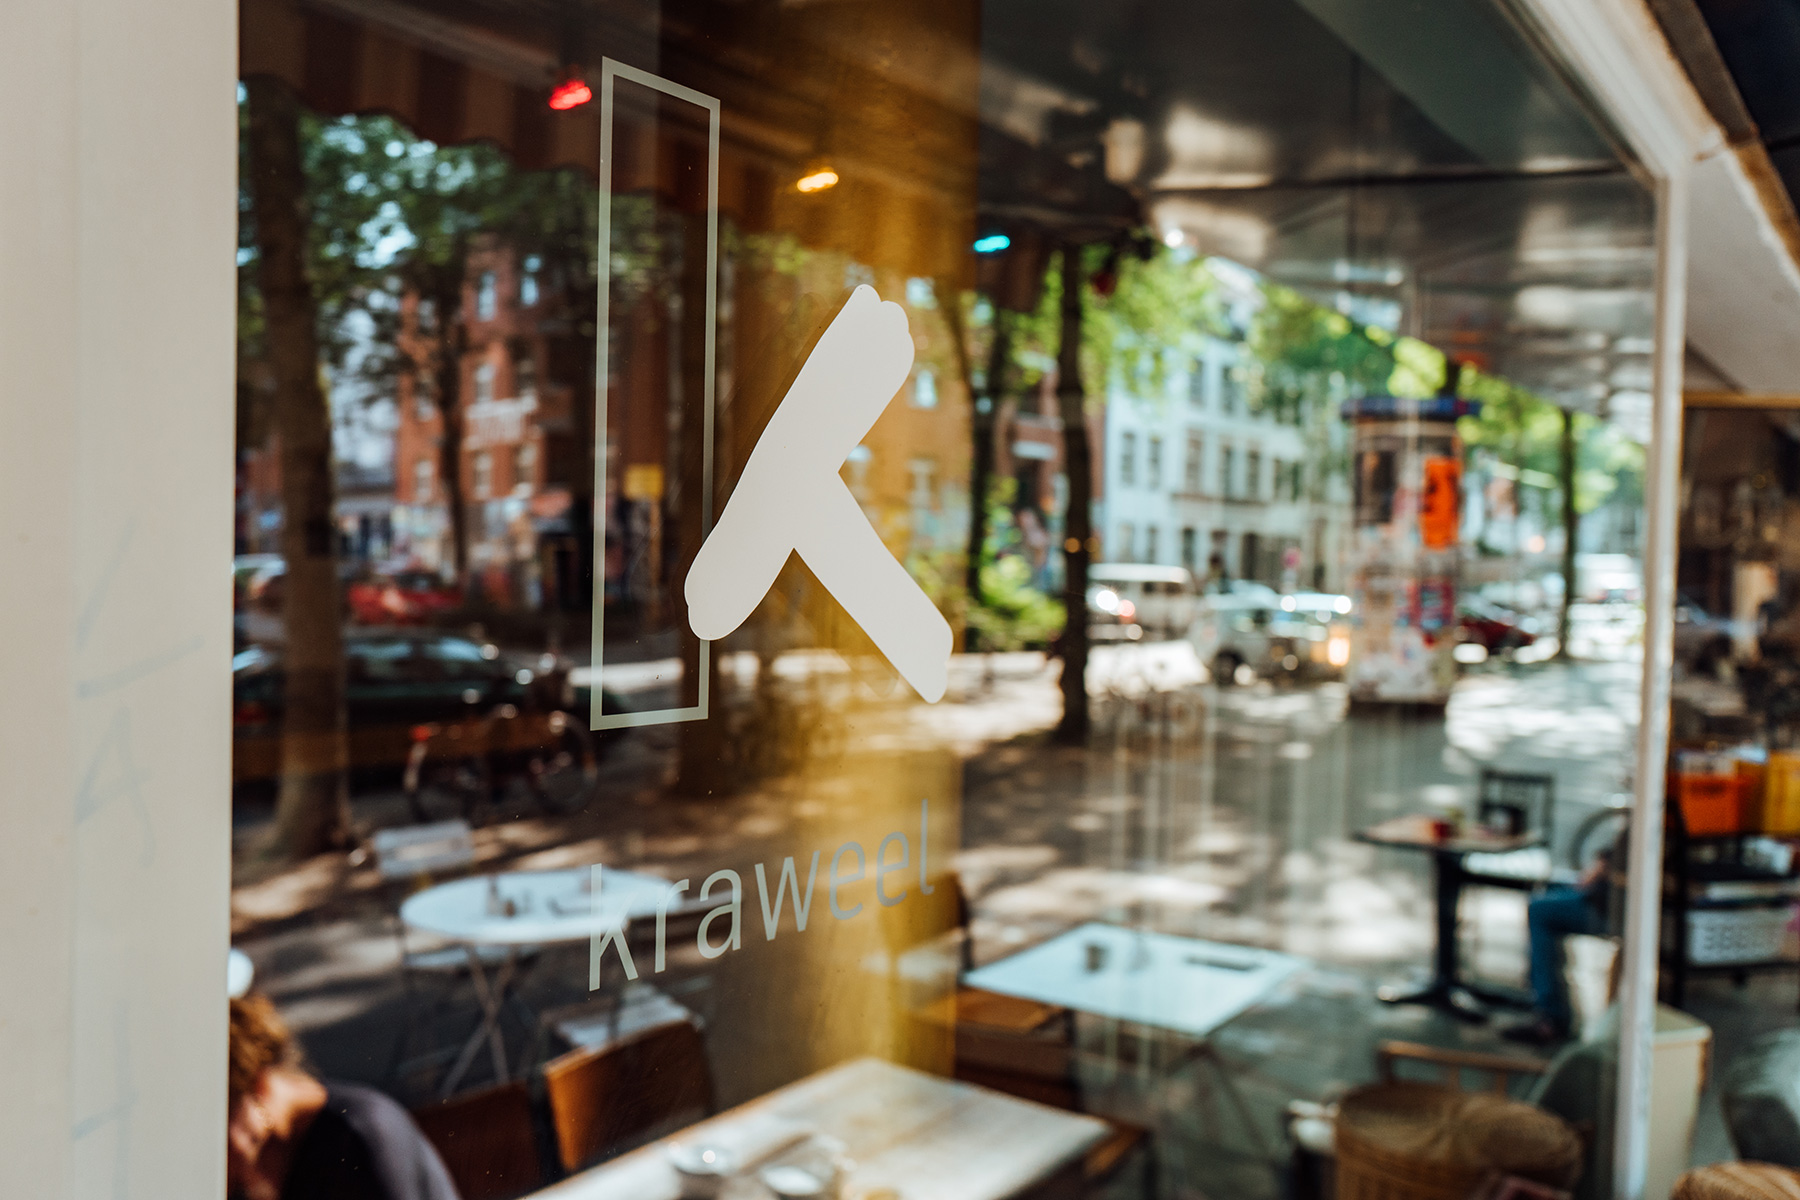 Kraweel StPauli cafe geheimtipp hamburg lisa knauer 01